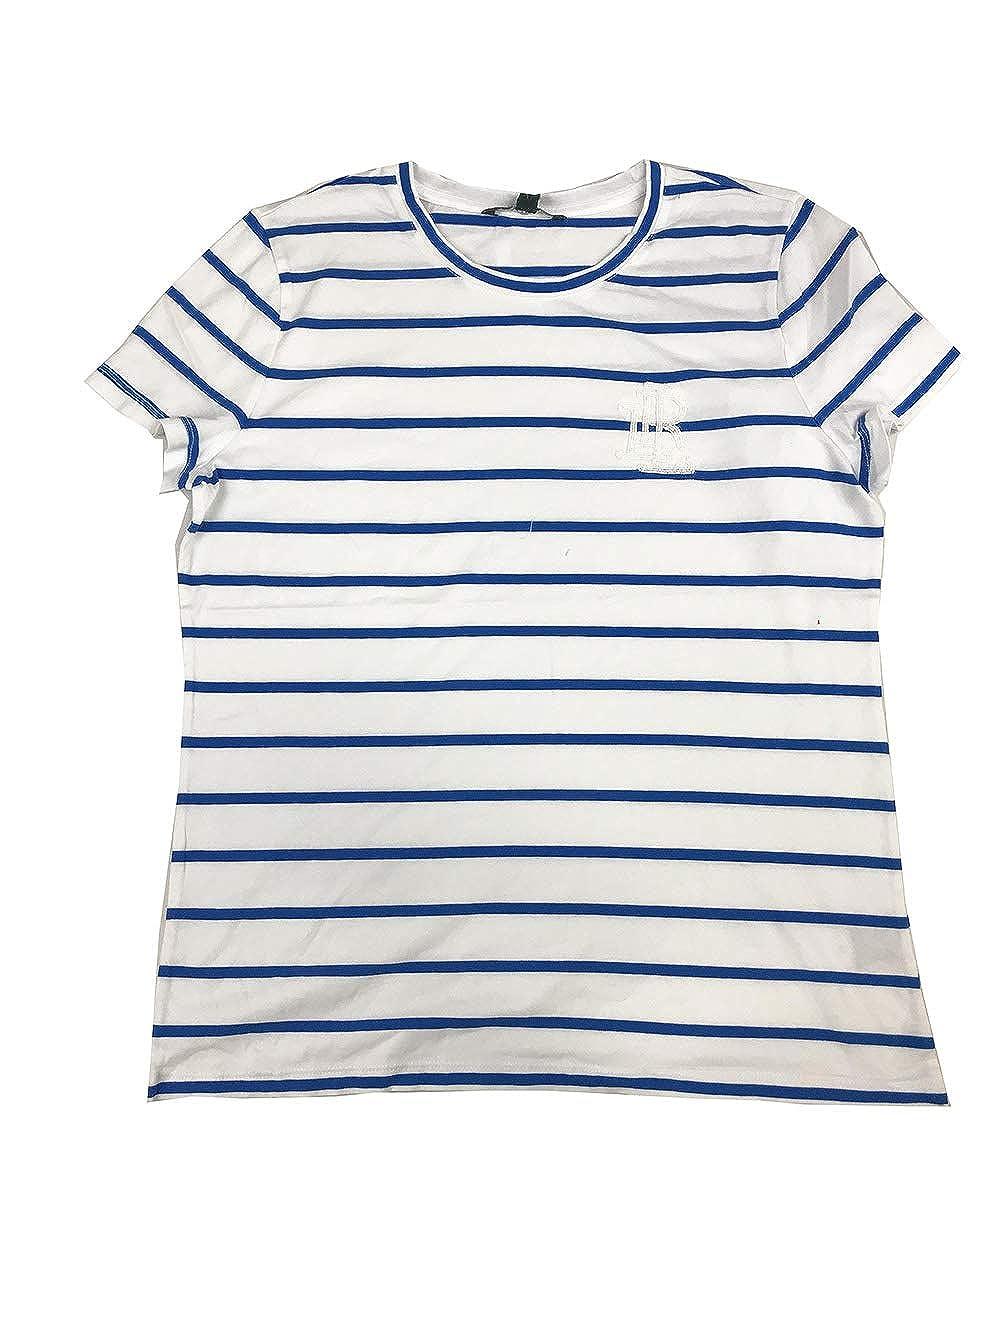 White Vivid Cyan Lauren Ralph Lauren Womens Casual Striped Logo TShirt